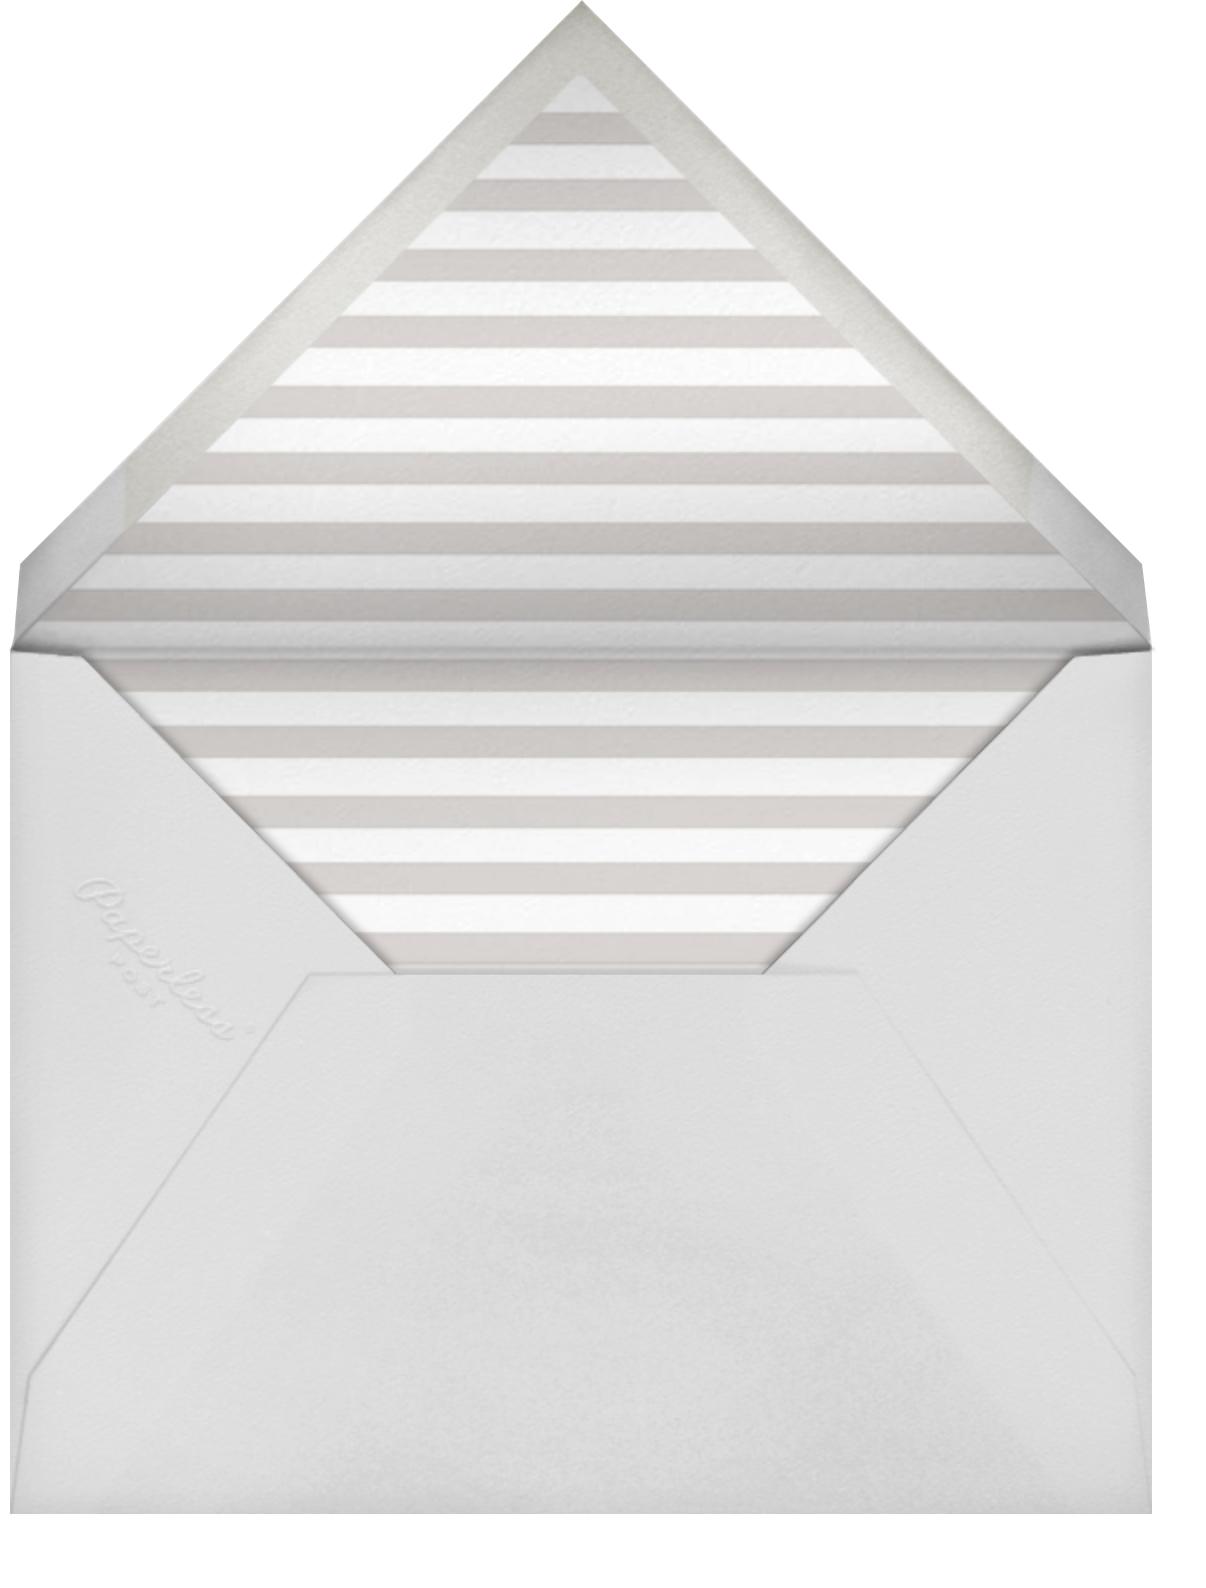 Square Frame - Horizontal (Gray) - Paperless Post - Memorial service - envelope back